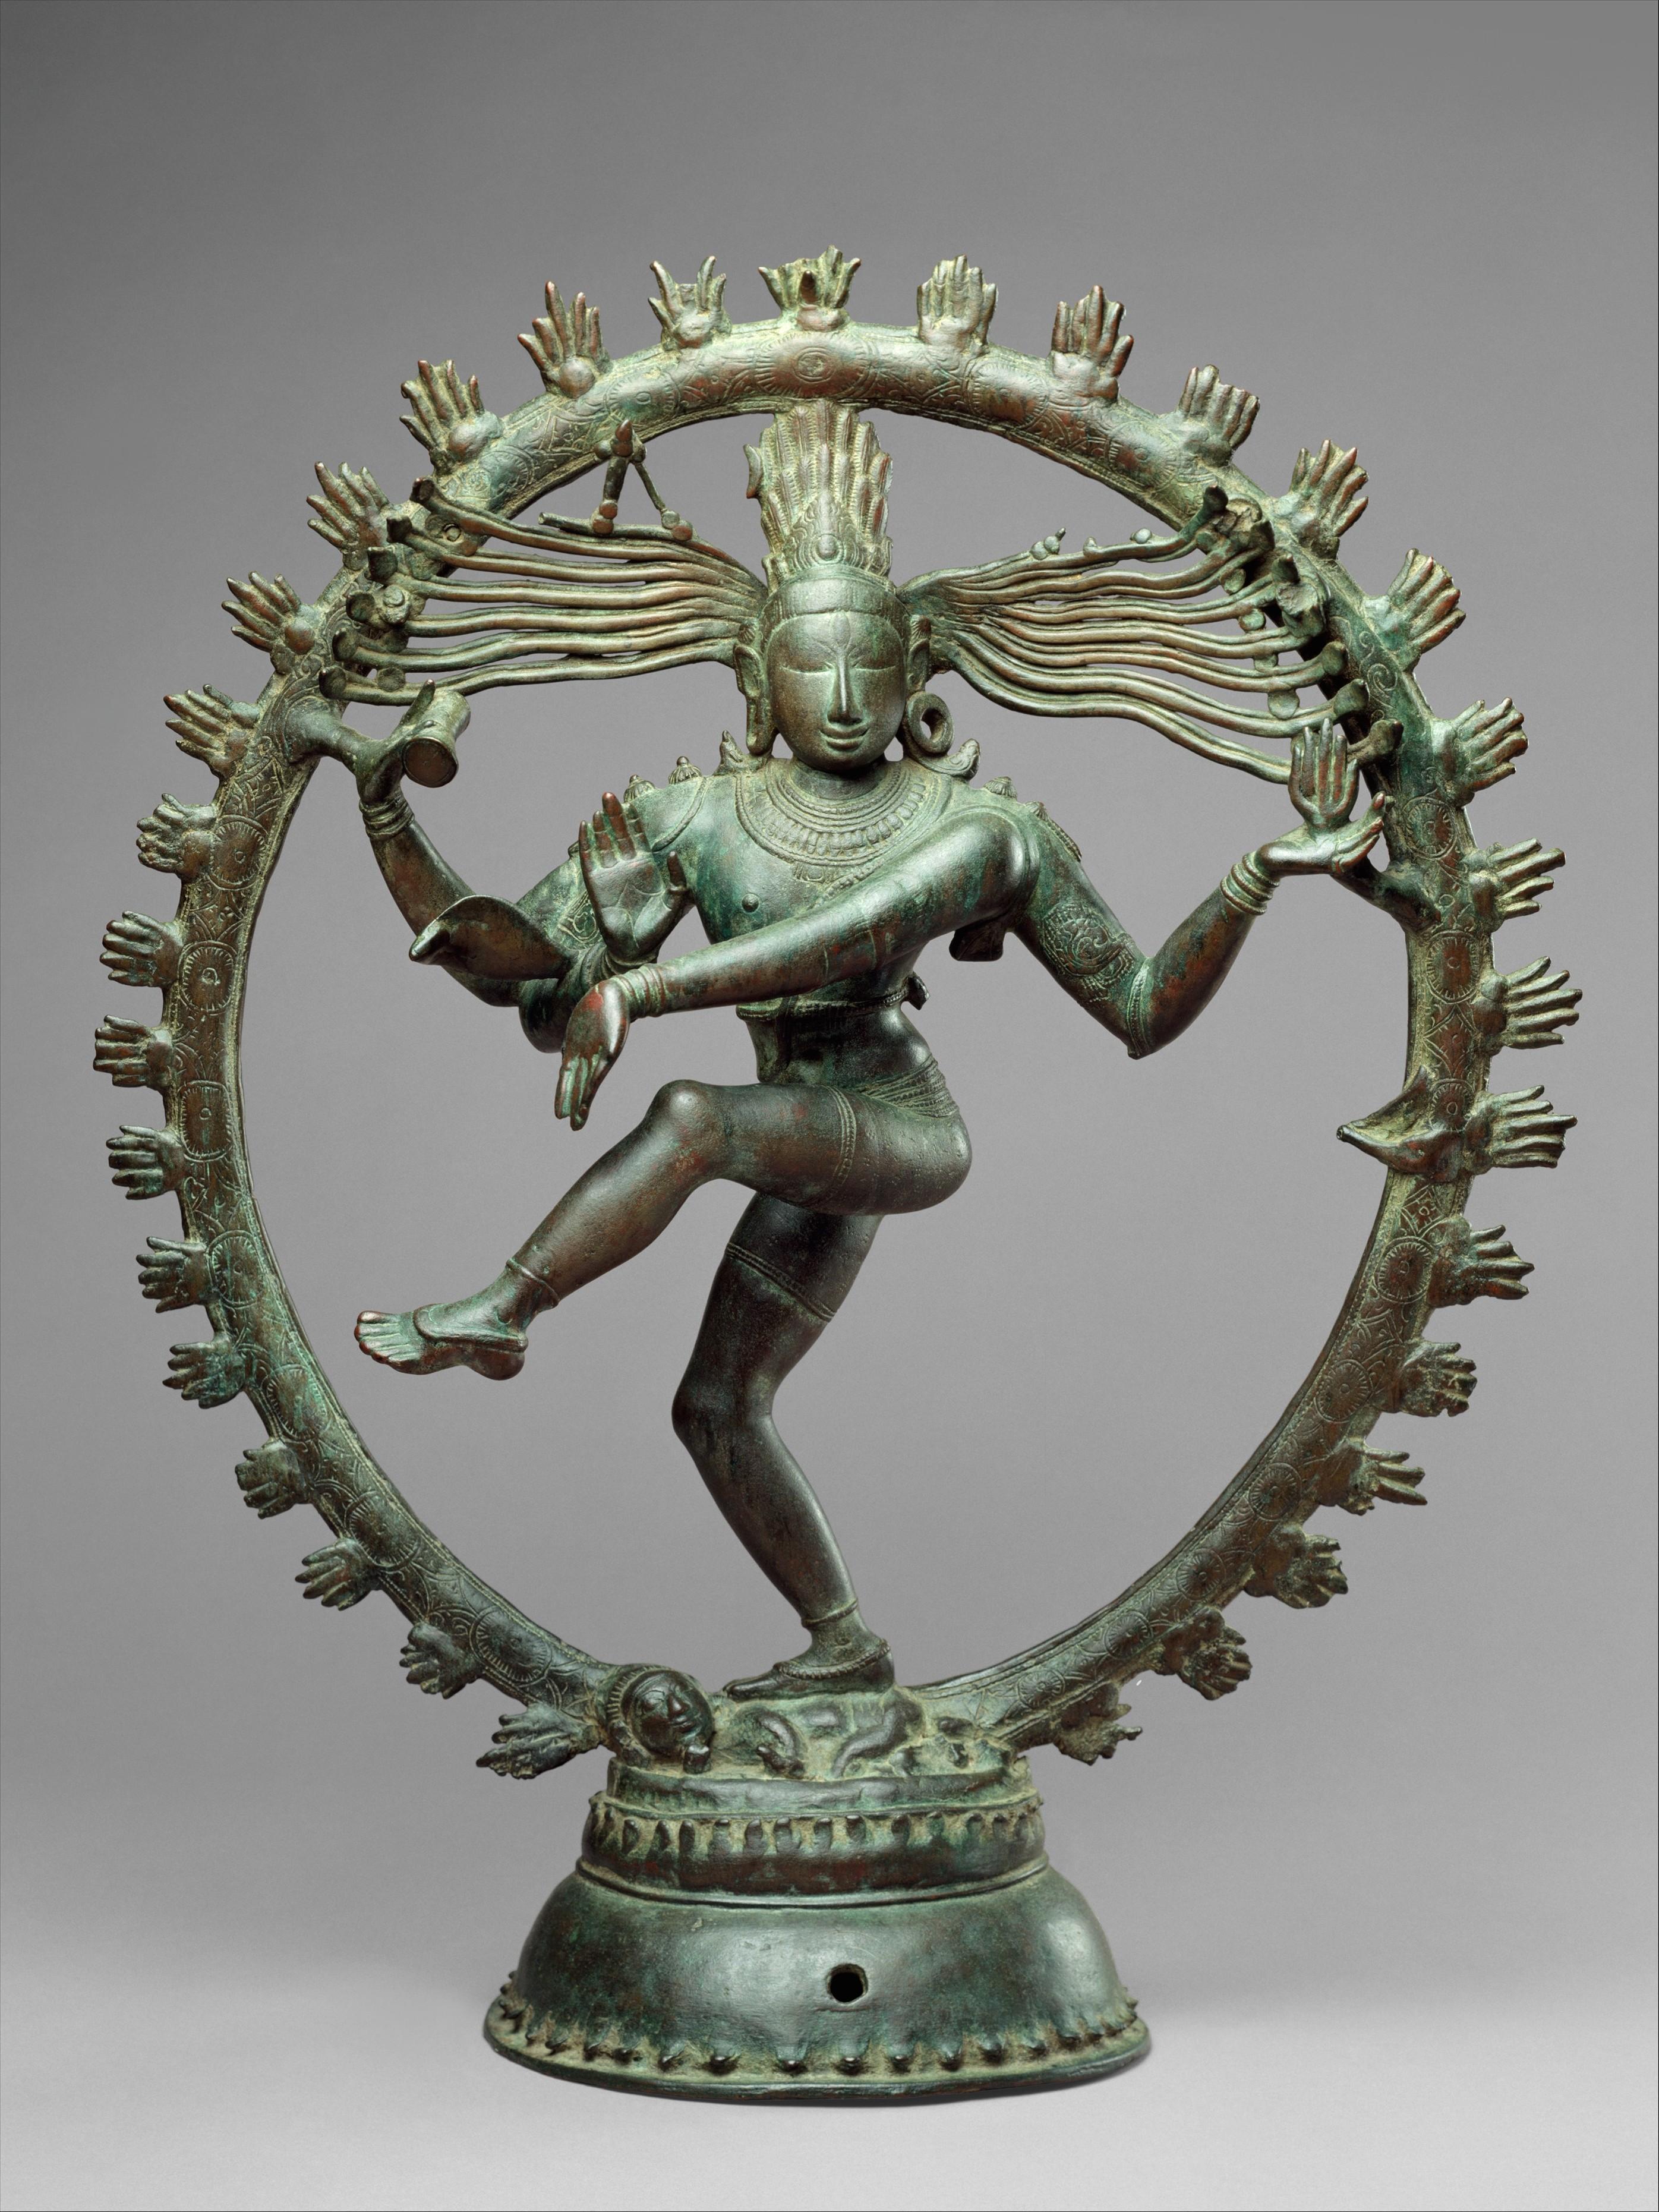 Shiva as Lord of Dance (Nataraja) | Indian (Tamil Nadu) | Chola